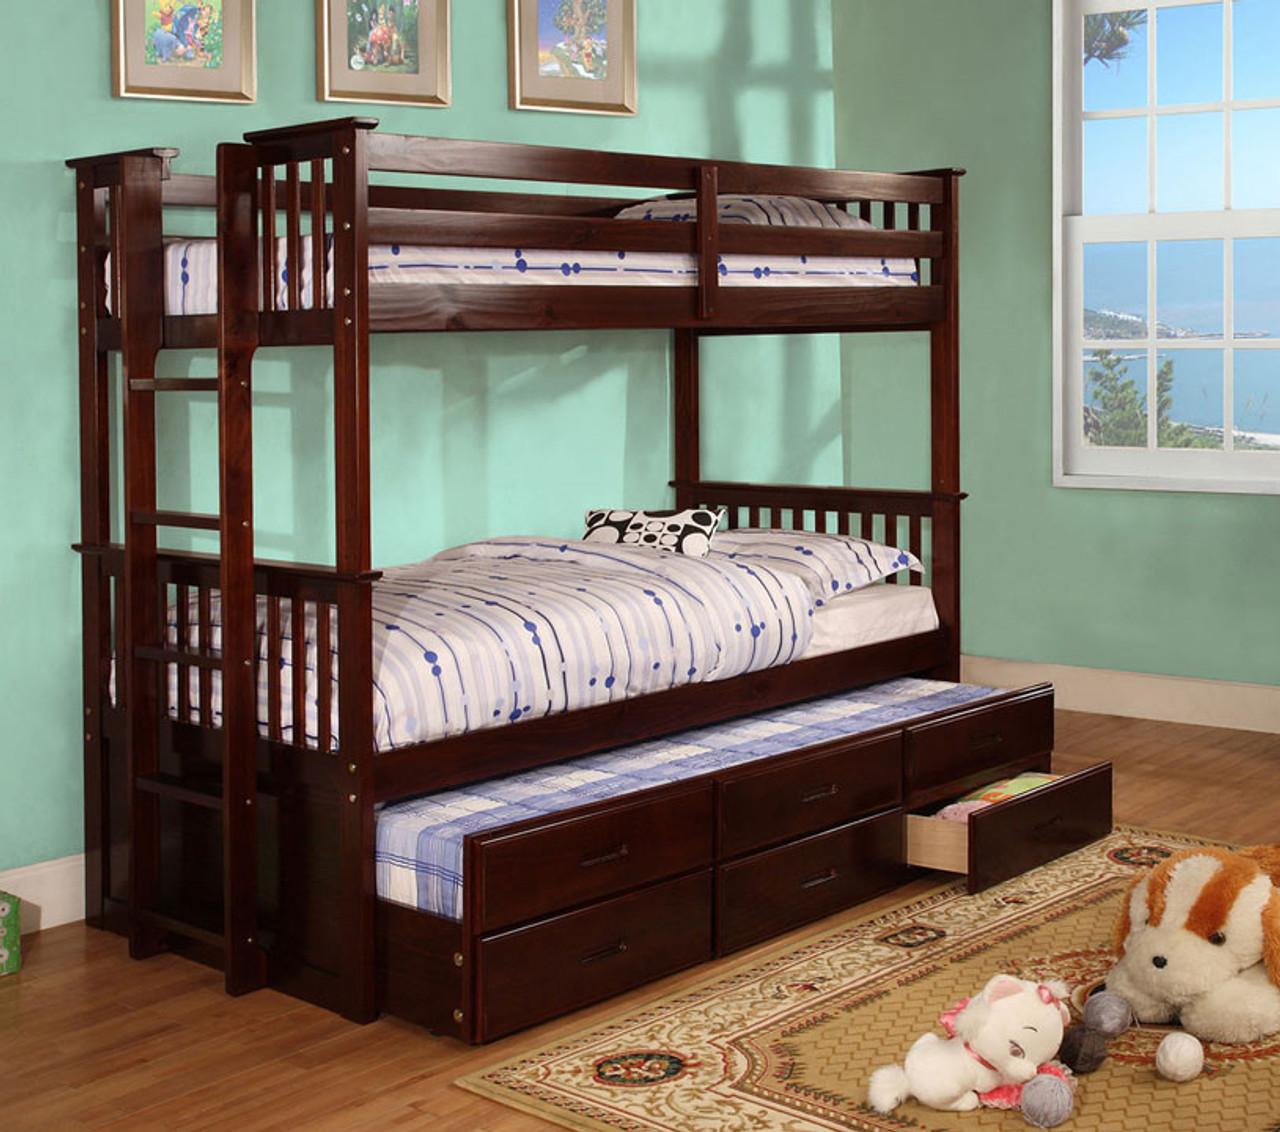 classic trundle bunk bed furniture of america. Black Bedroom Furniture Sets. Home Design Ideas